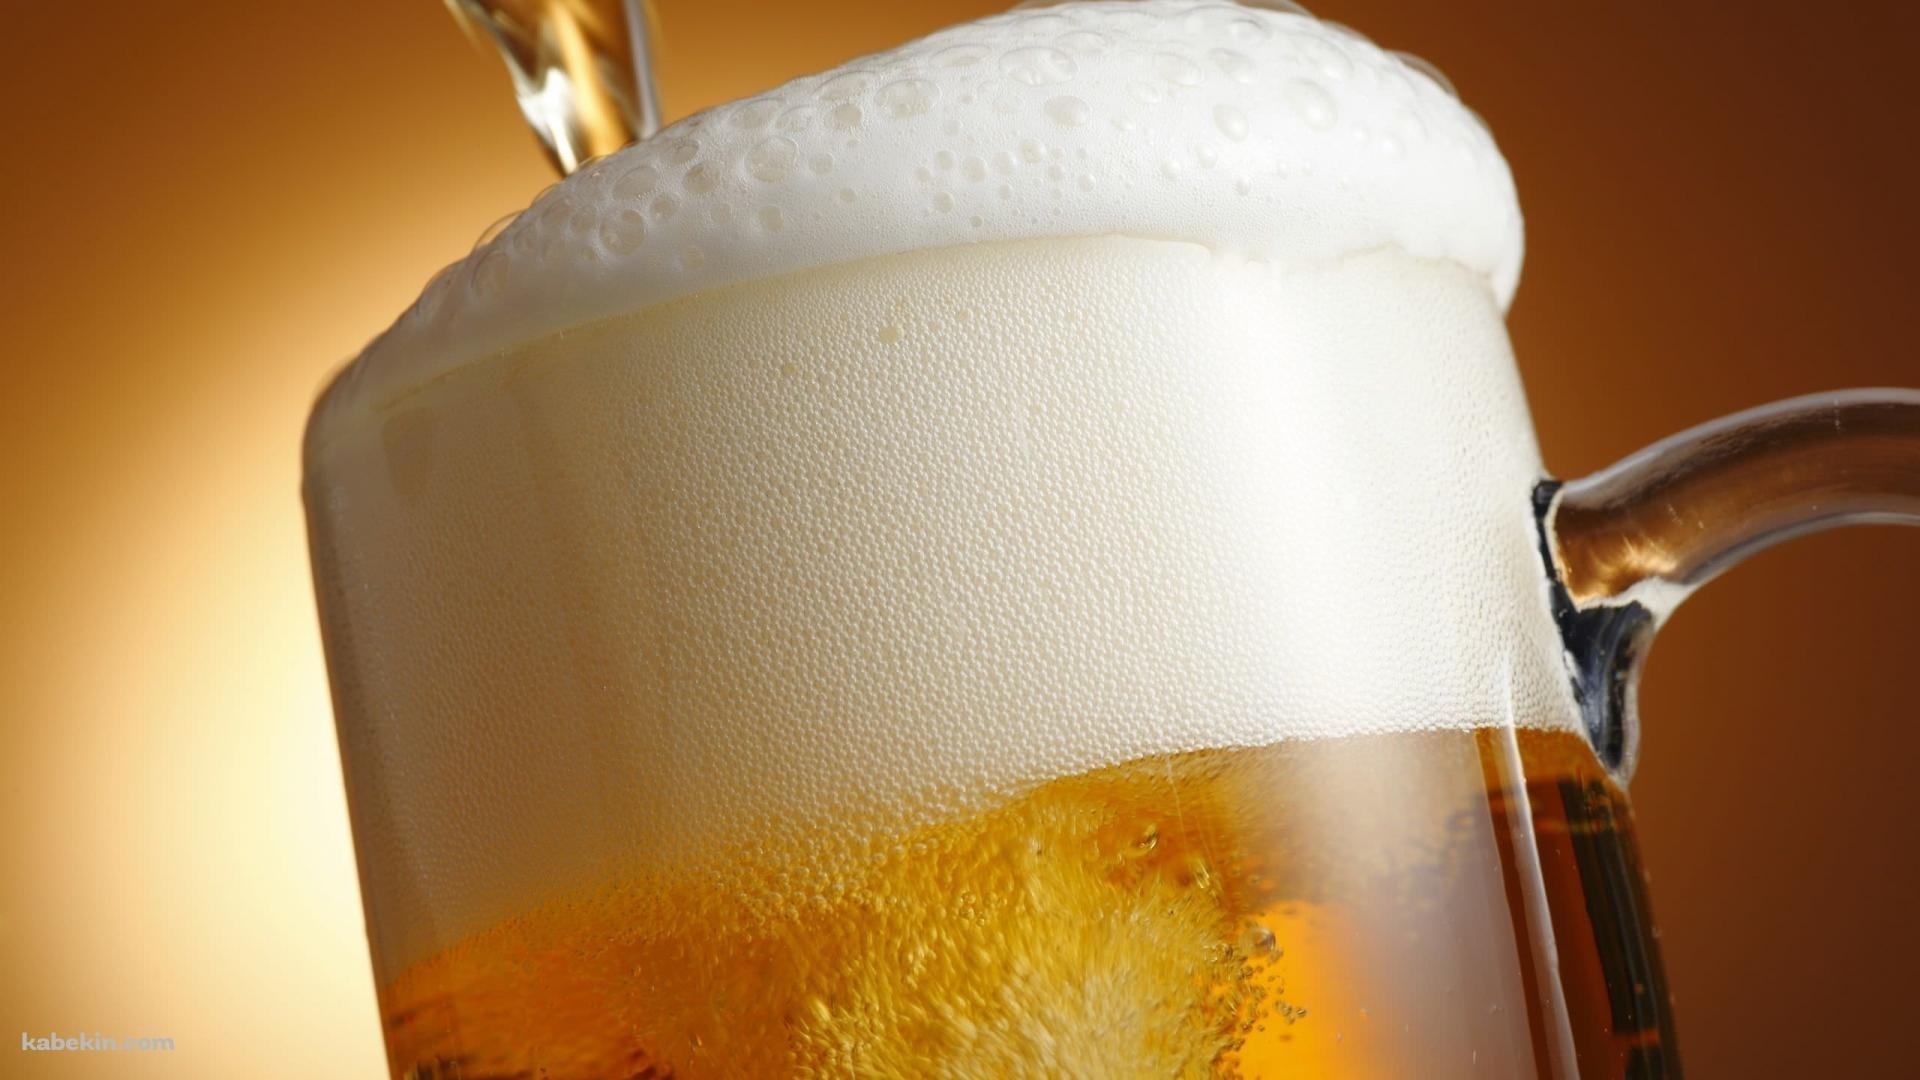 Beer Full HD Wallpaper